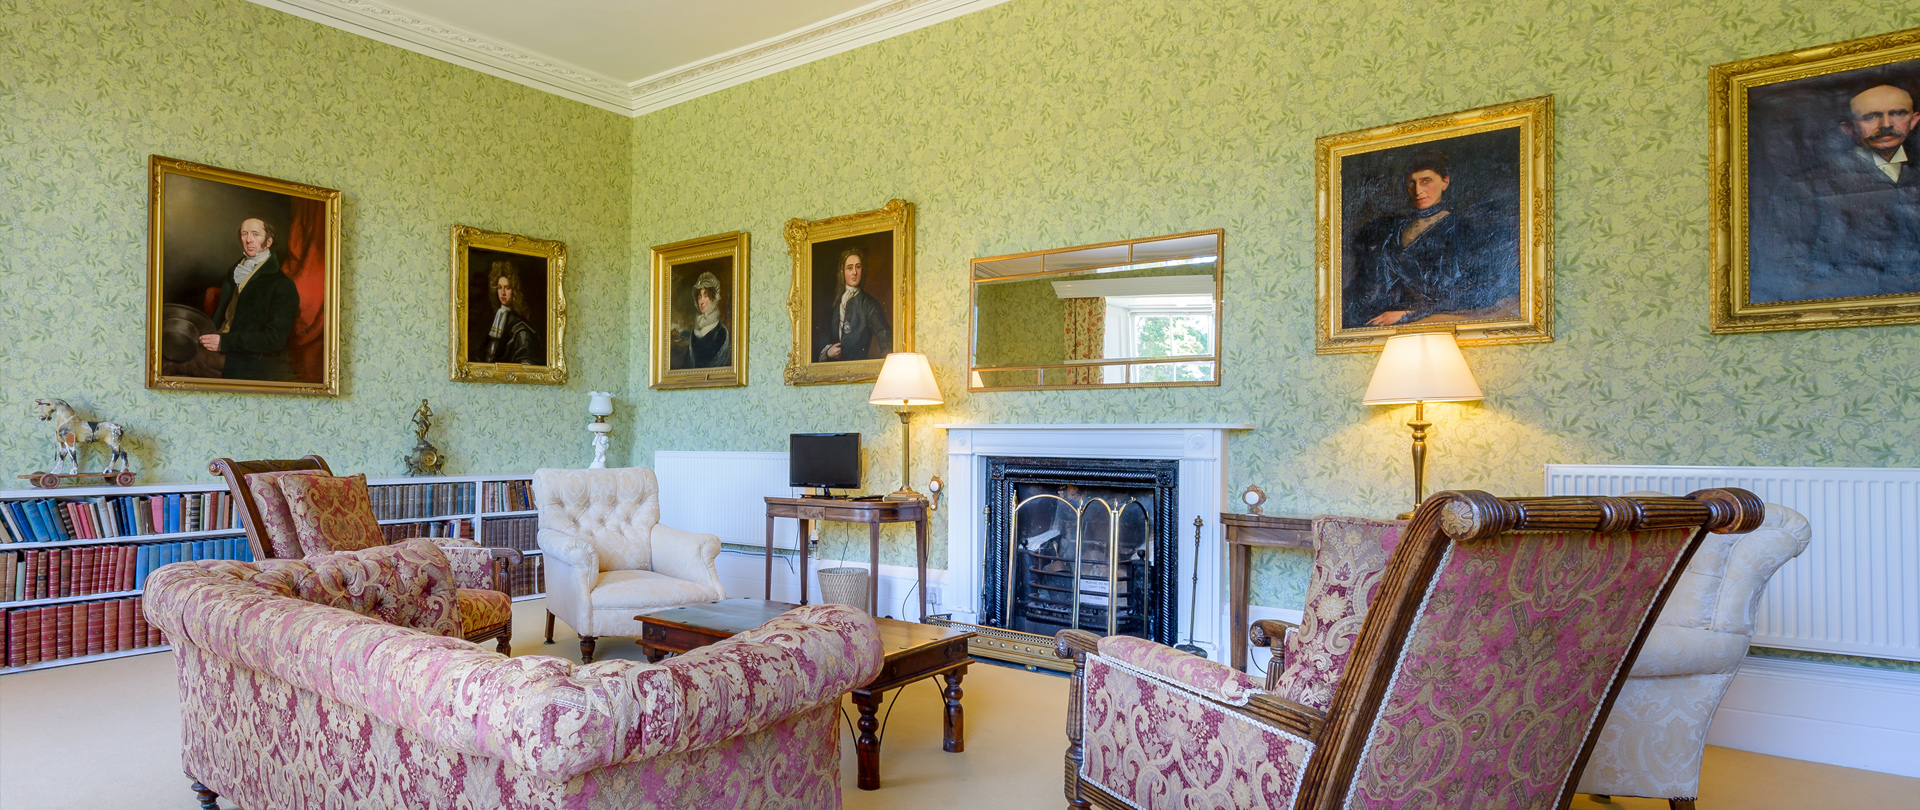 Nancealverne House history